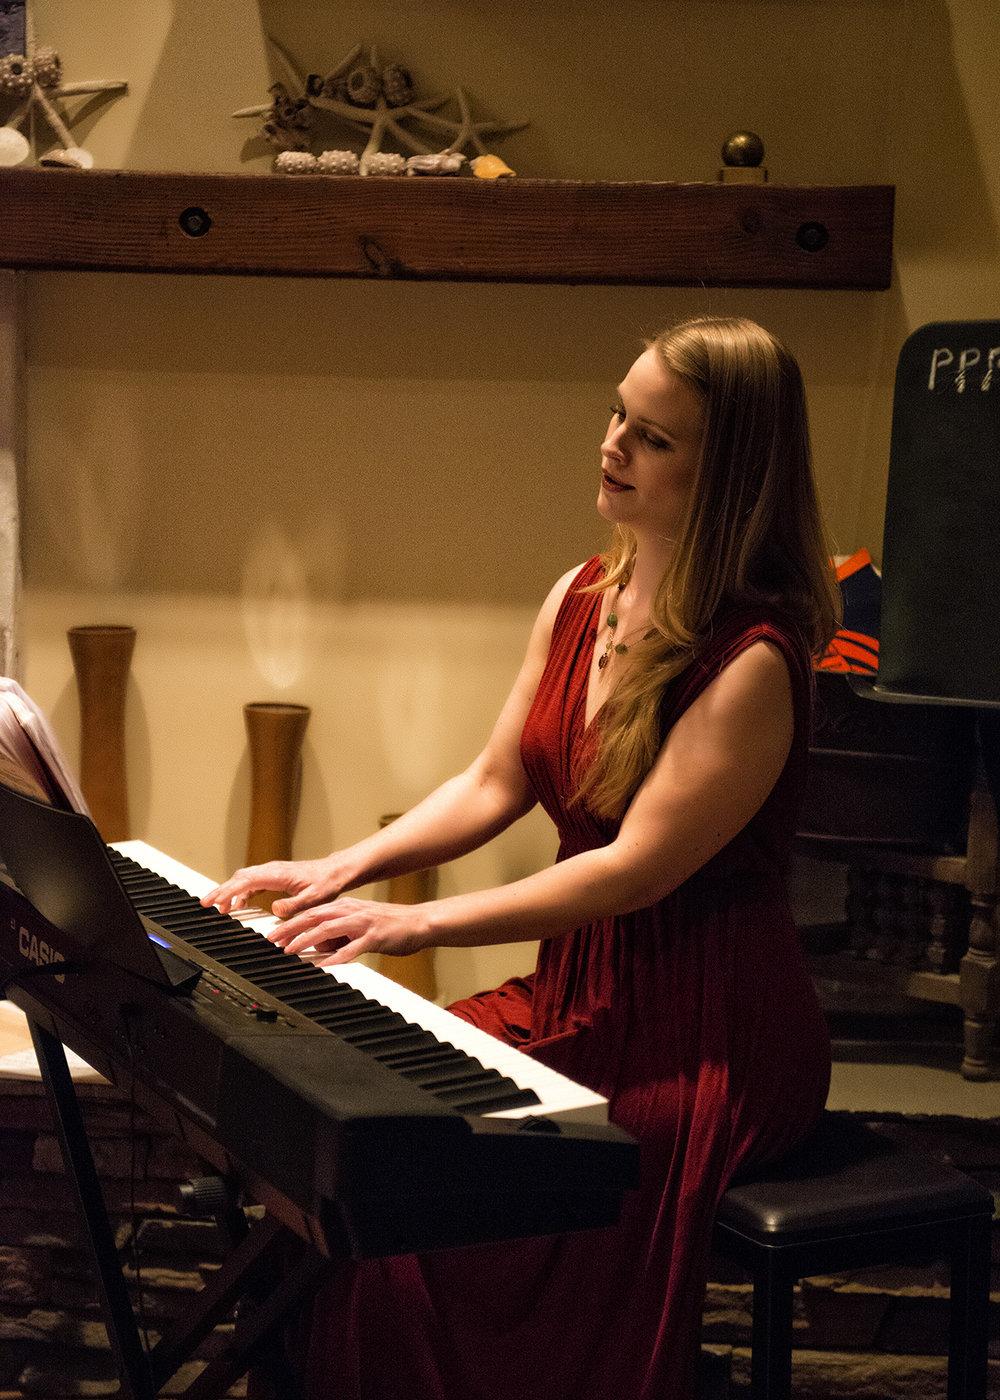 Laurel Sanders plays piano in Pacific Palisades